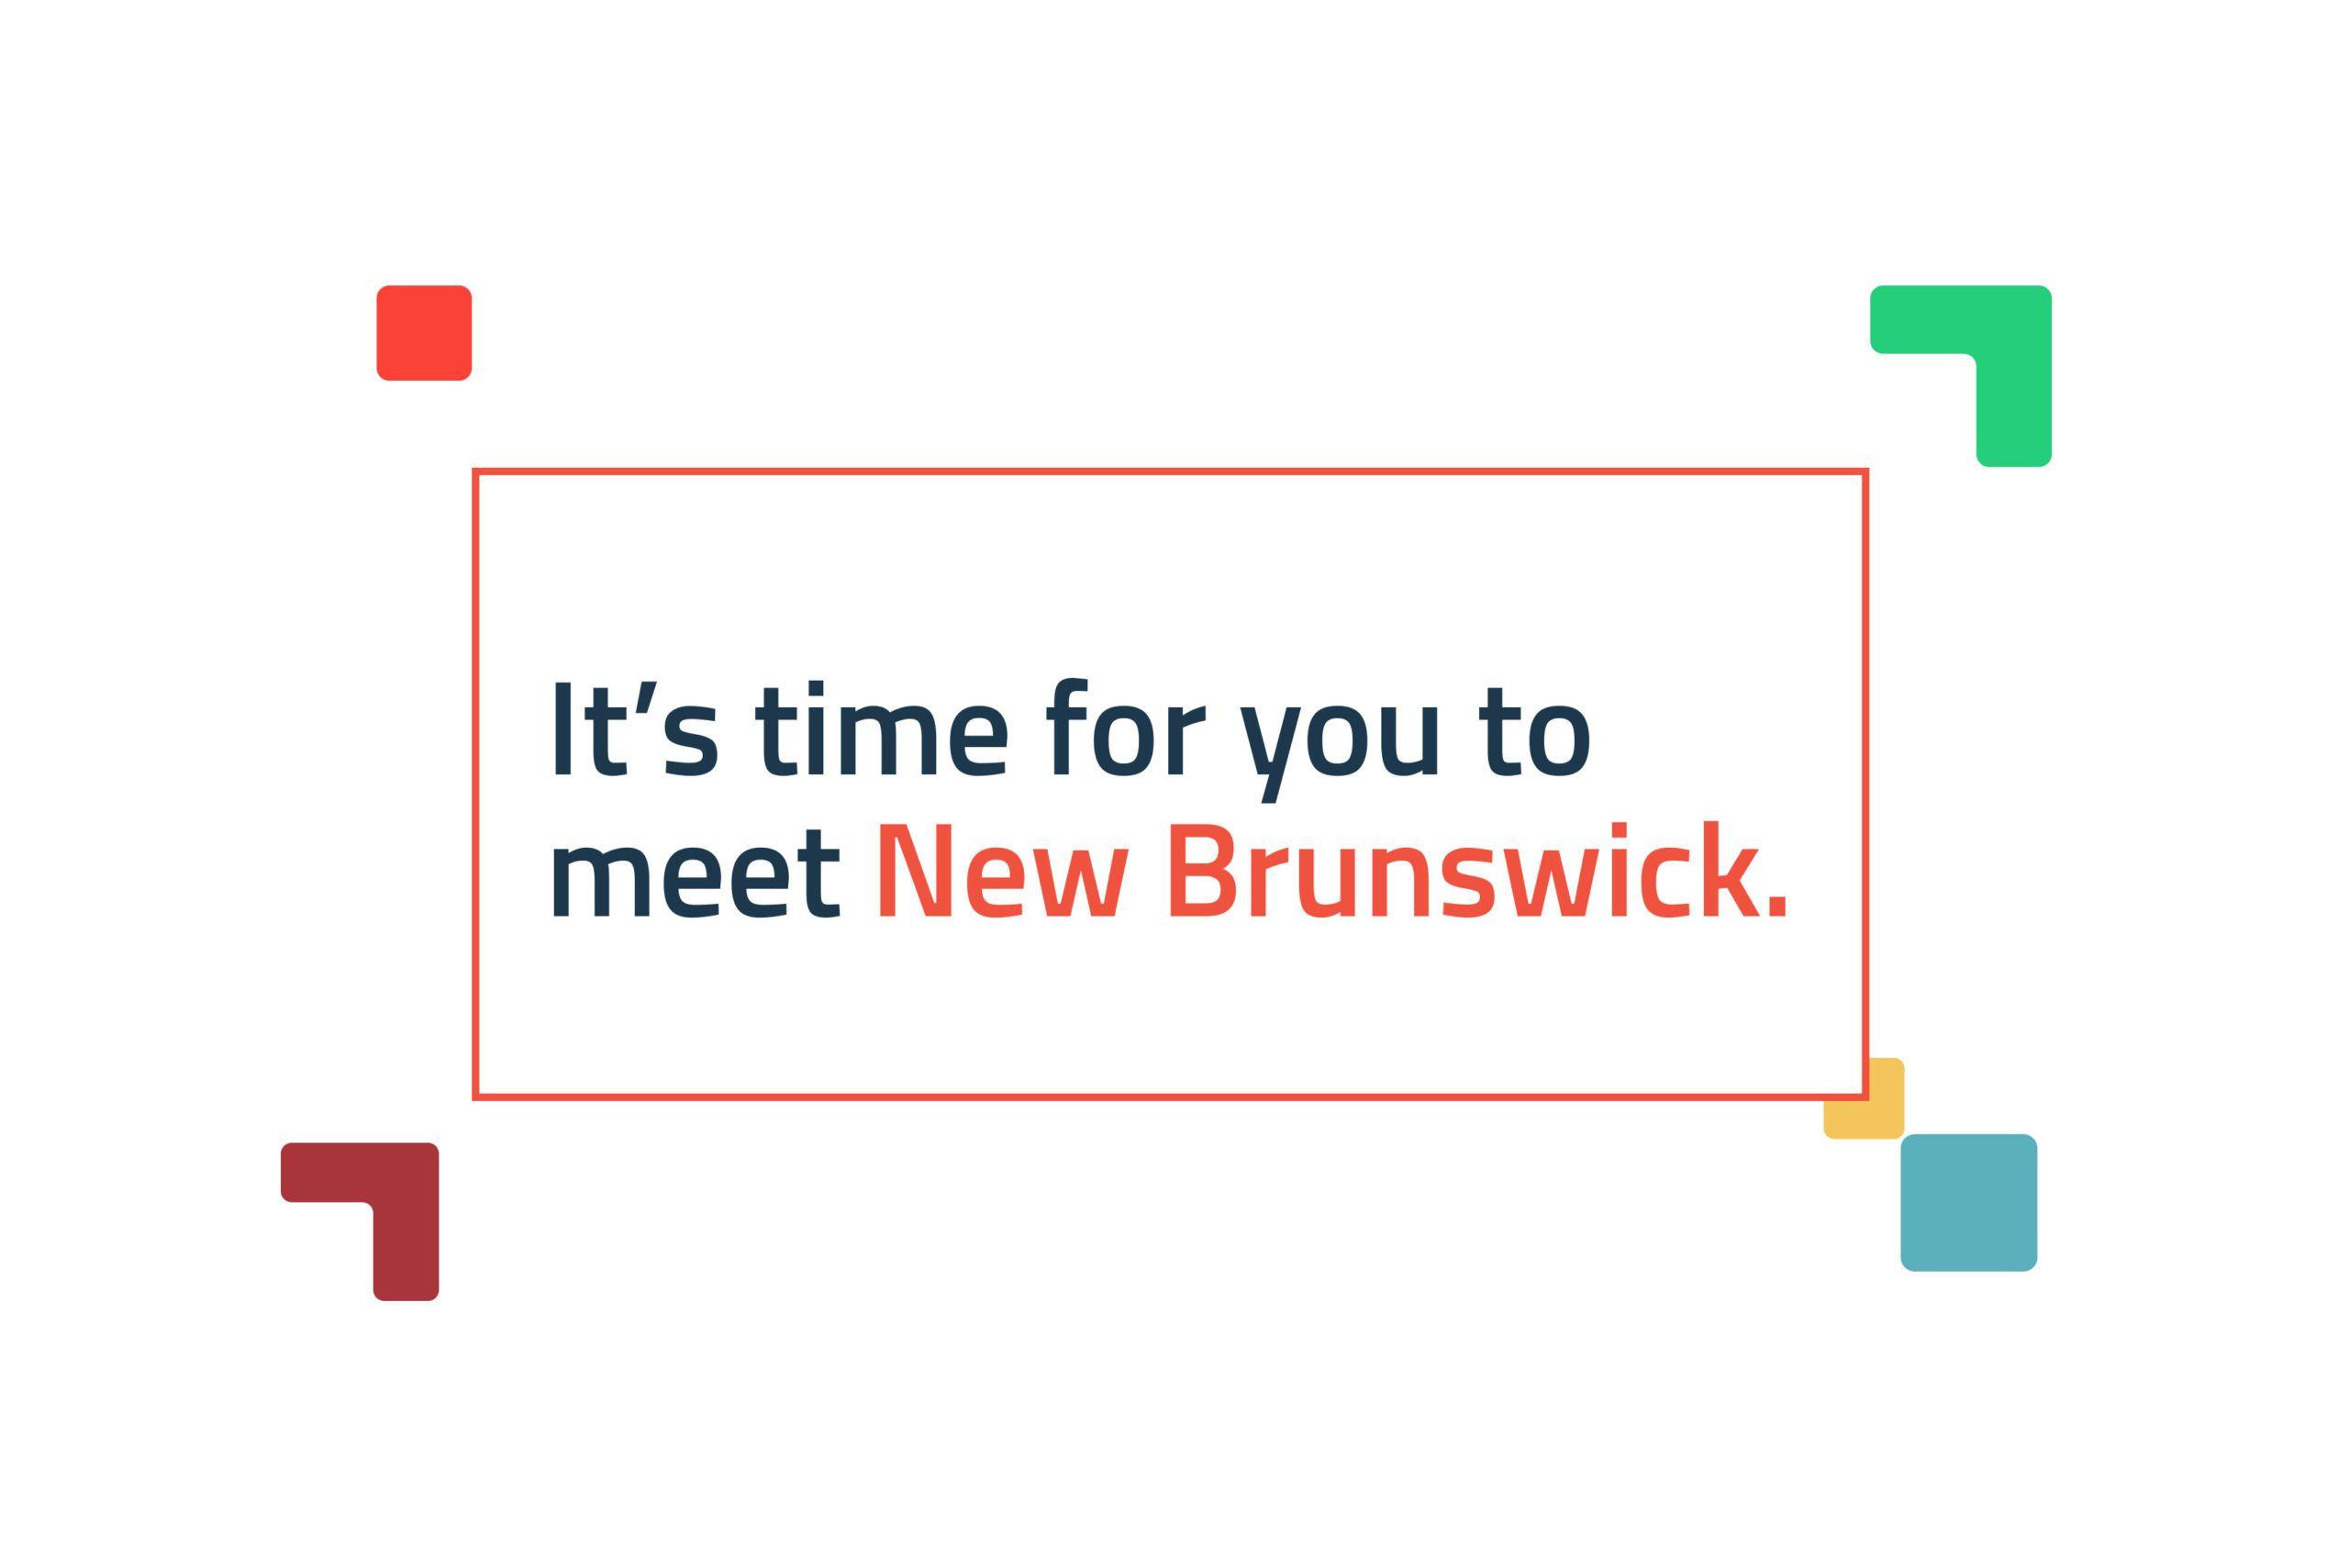 Opportunities New Brunswick brand